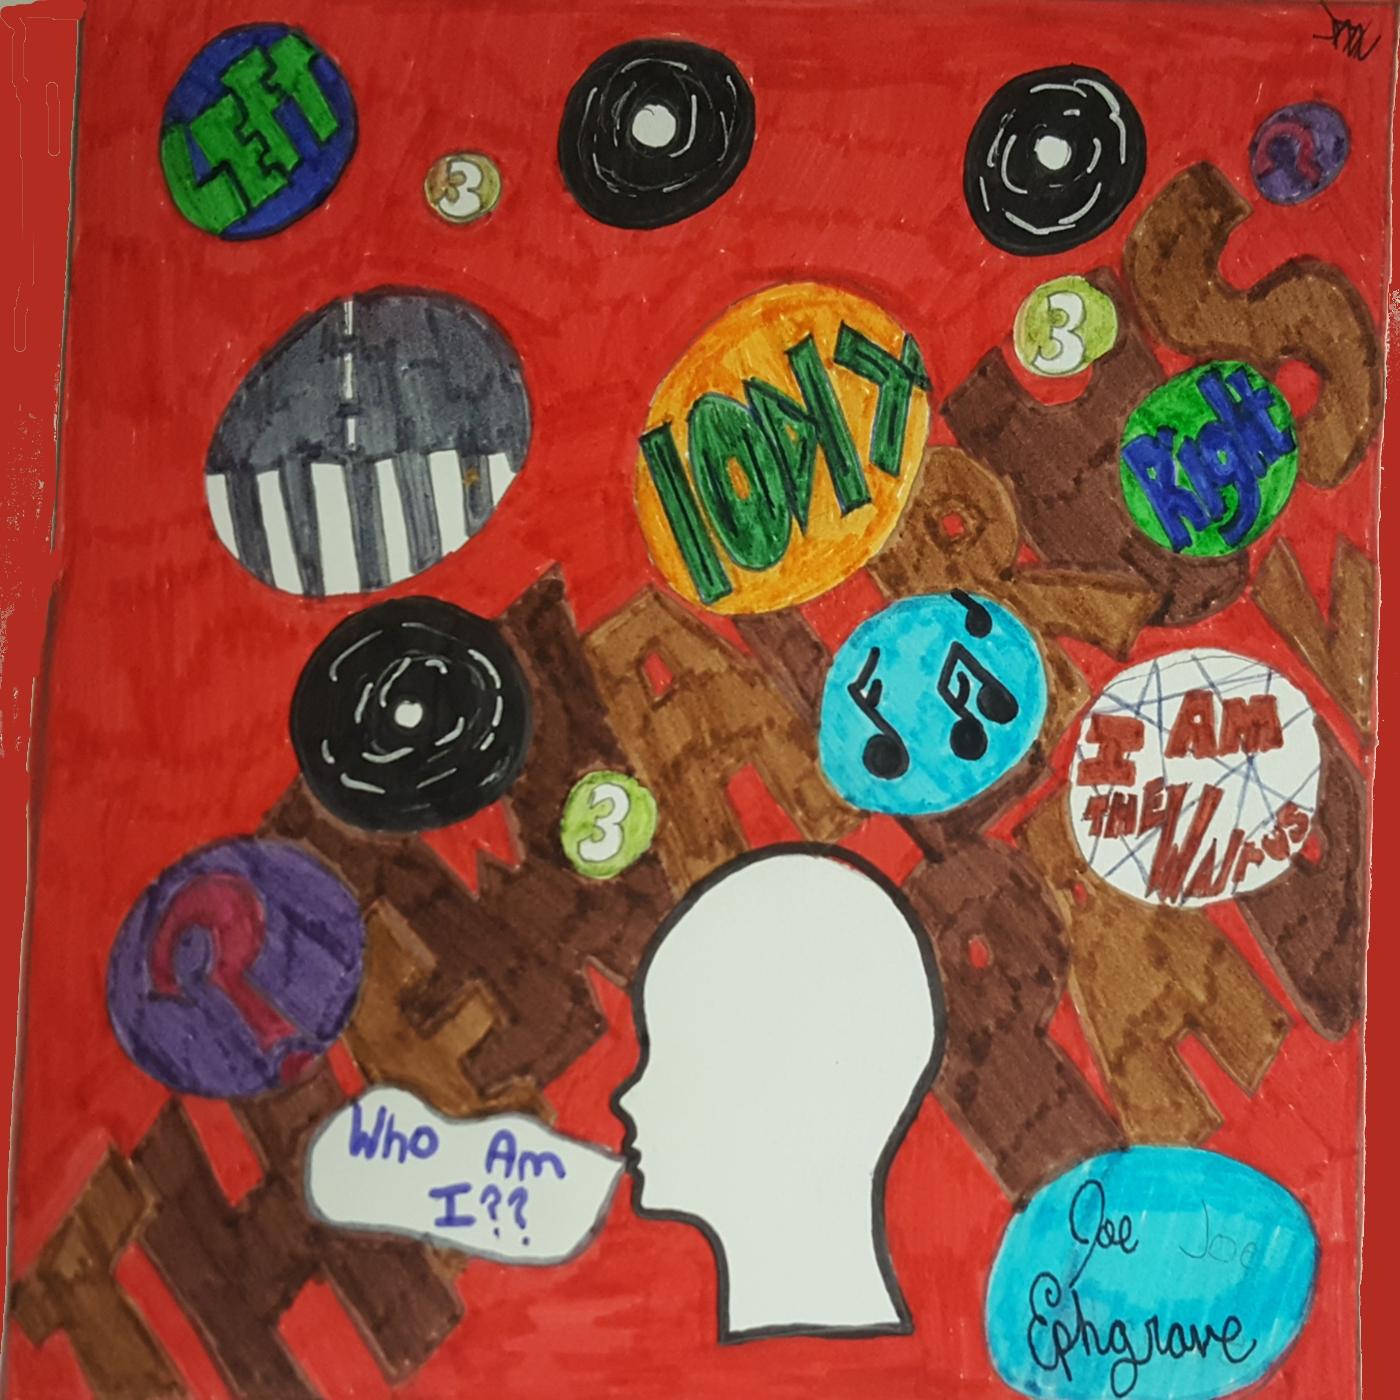 Album art by Jazz